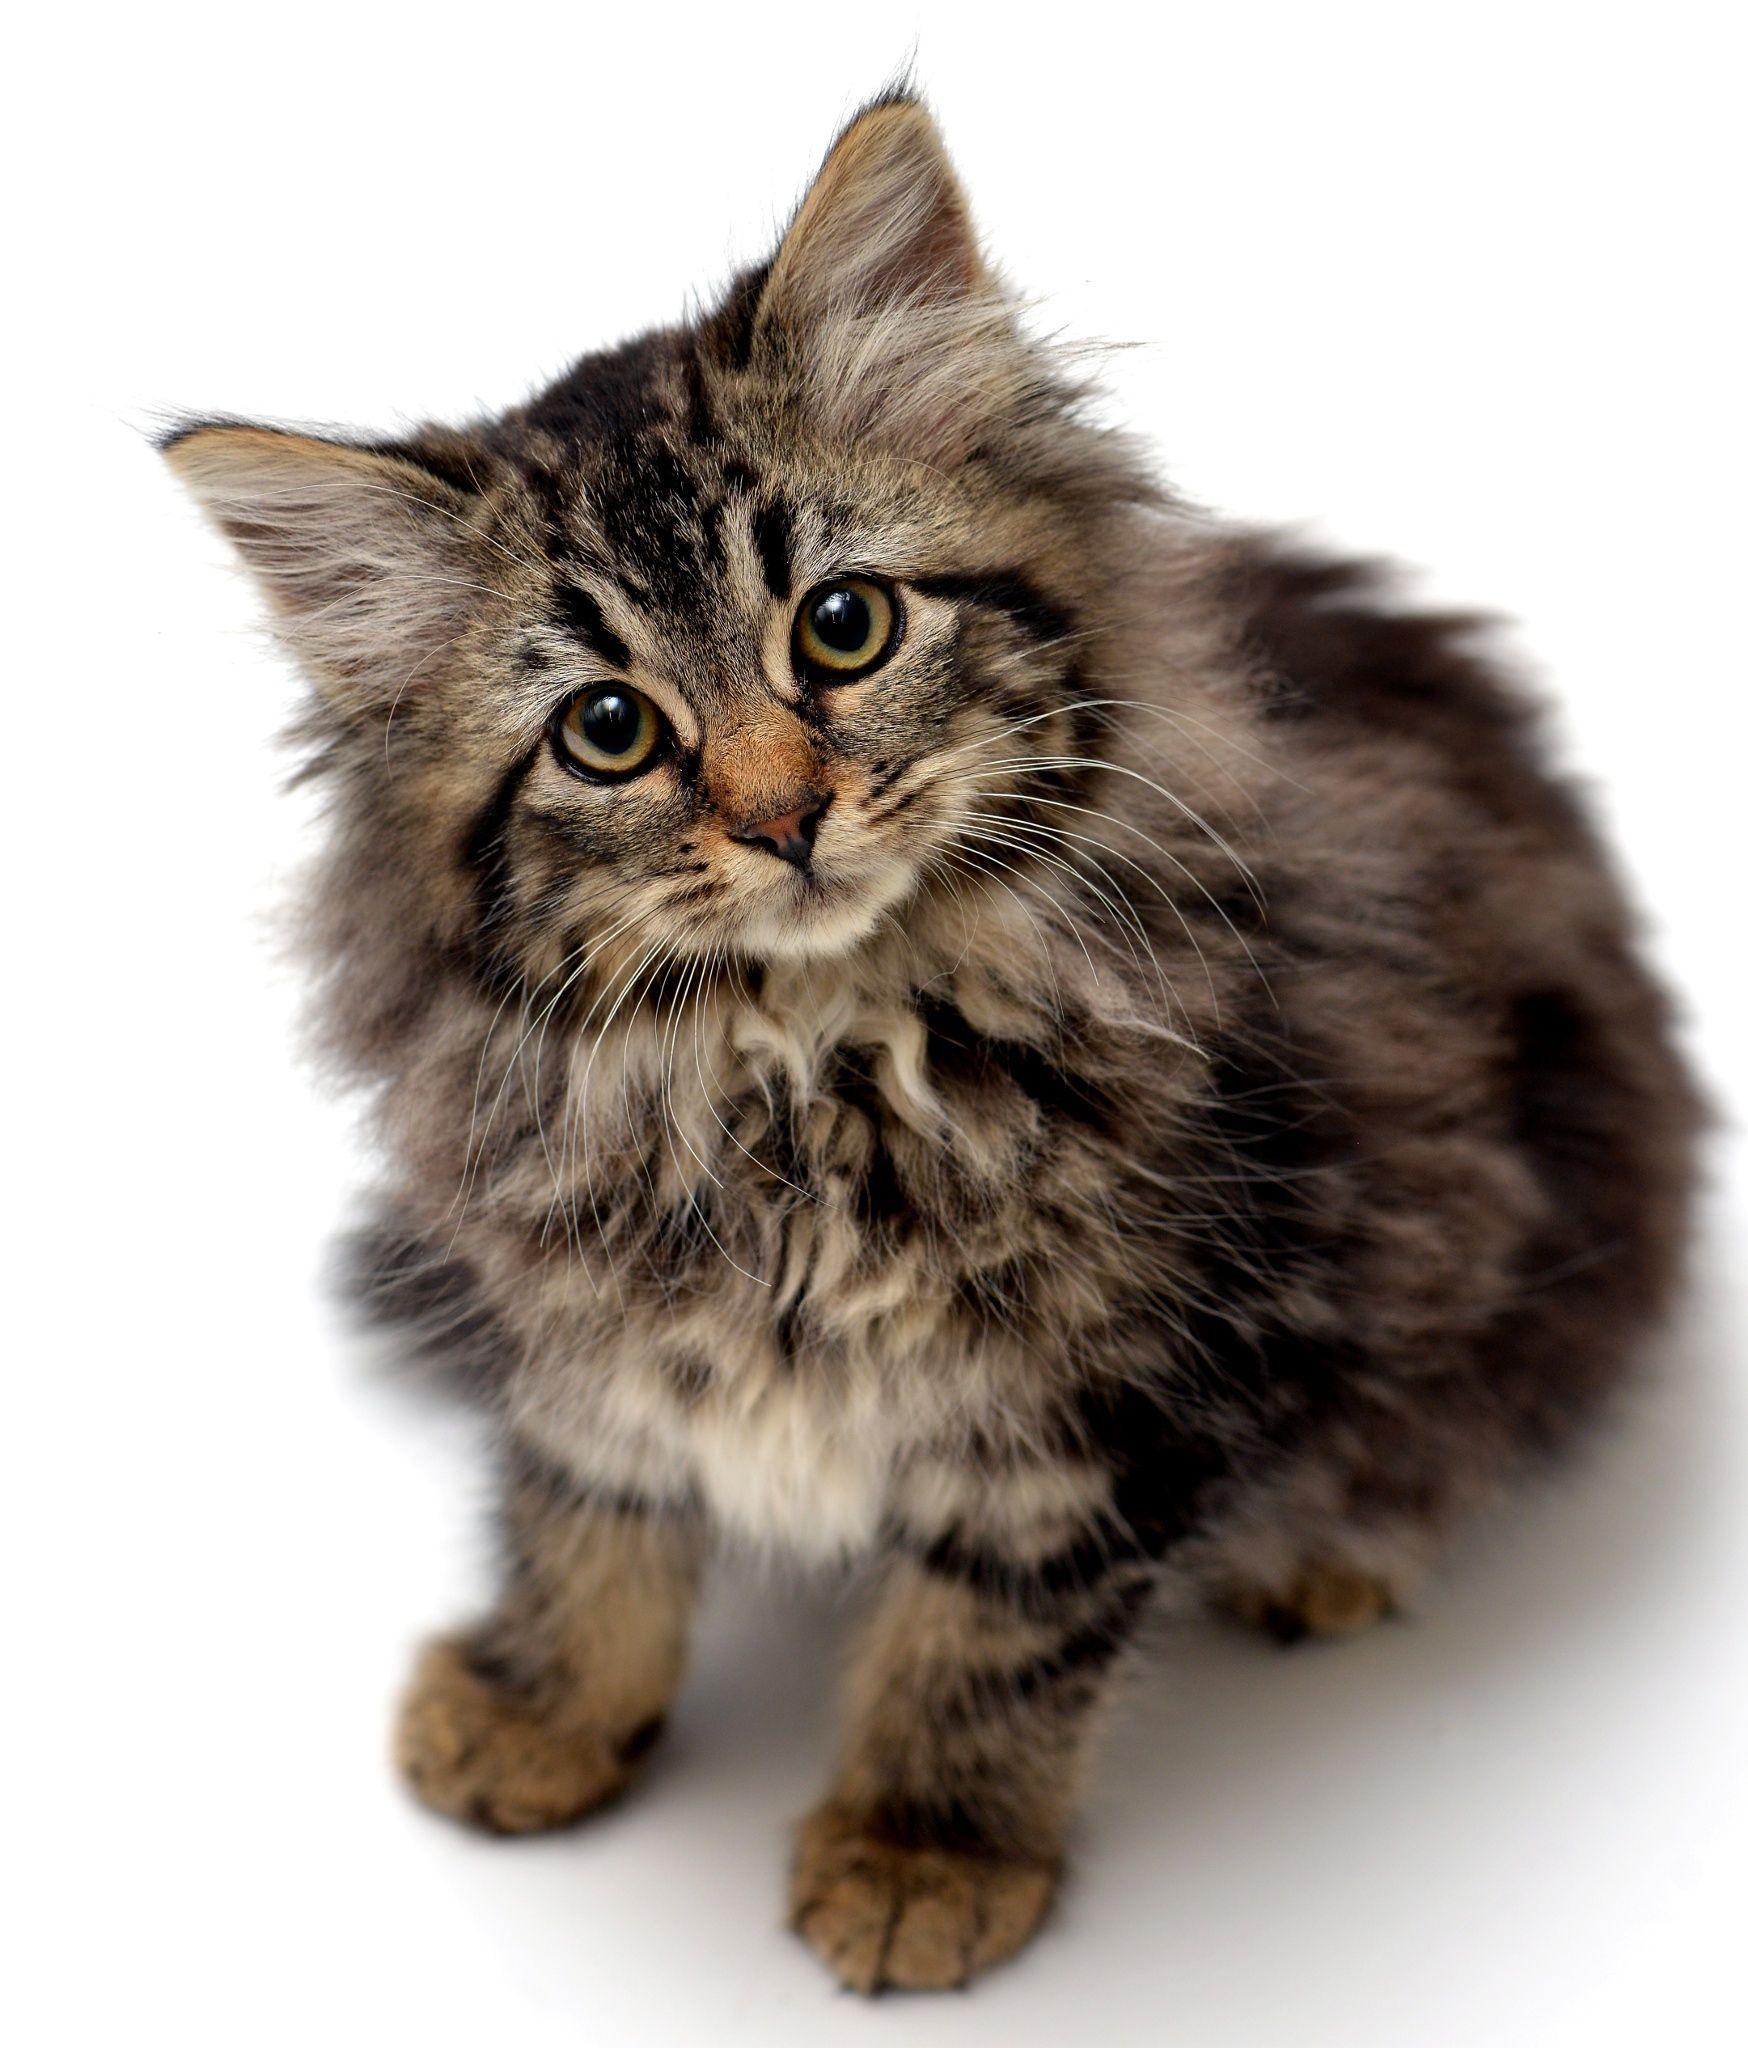 This Is A Long Hair Tabby Kitten Named Ginny By Josh Norem Russische Blaue Katzchen Katzen Draussen Blaue Katzen